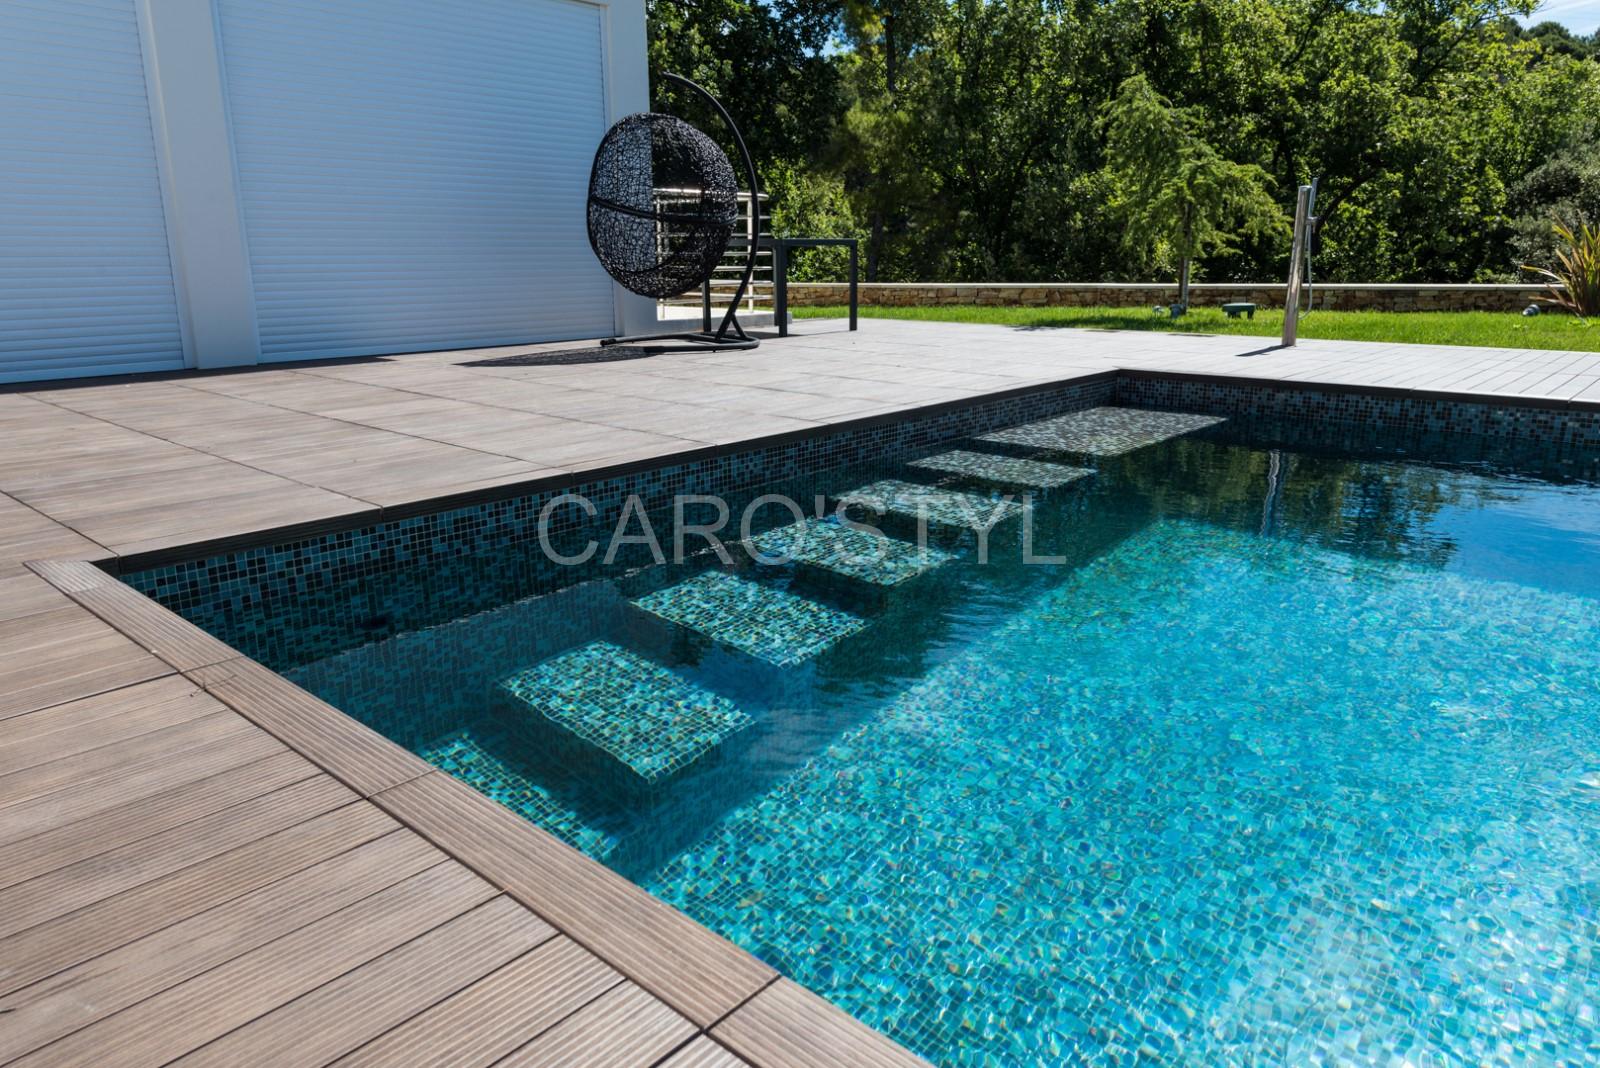 Piscines en pate de verre Bisazza, pour une piscine grand bleu! - Magasin de carrelage, pierre ...